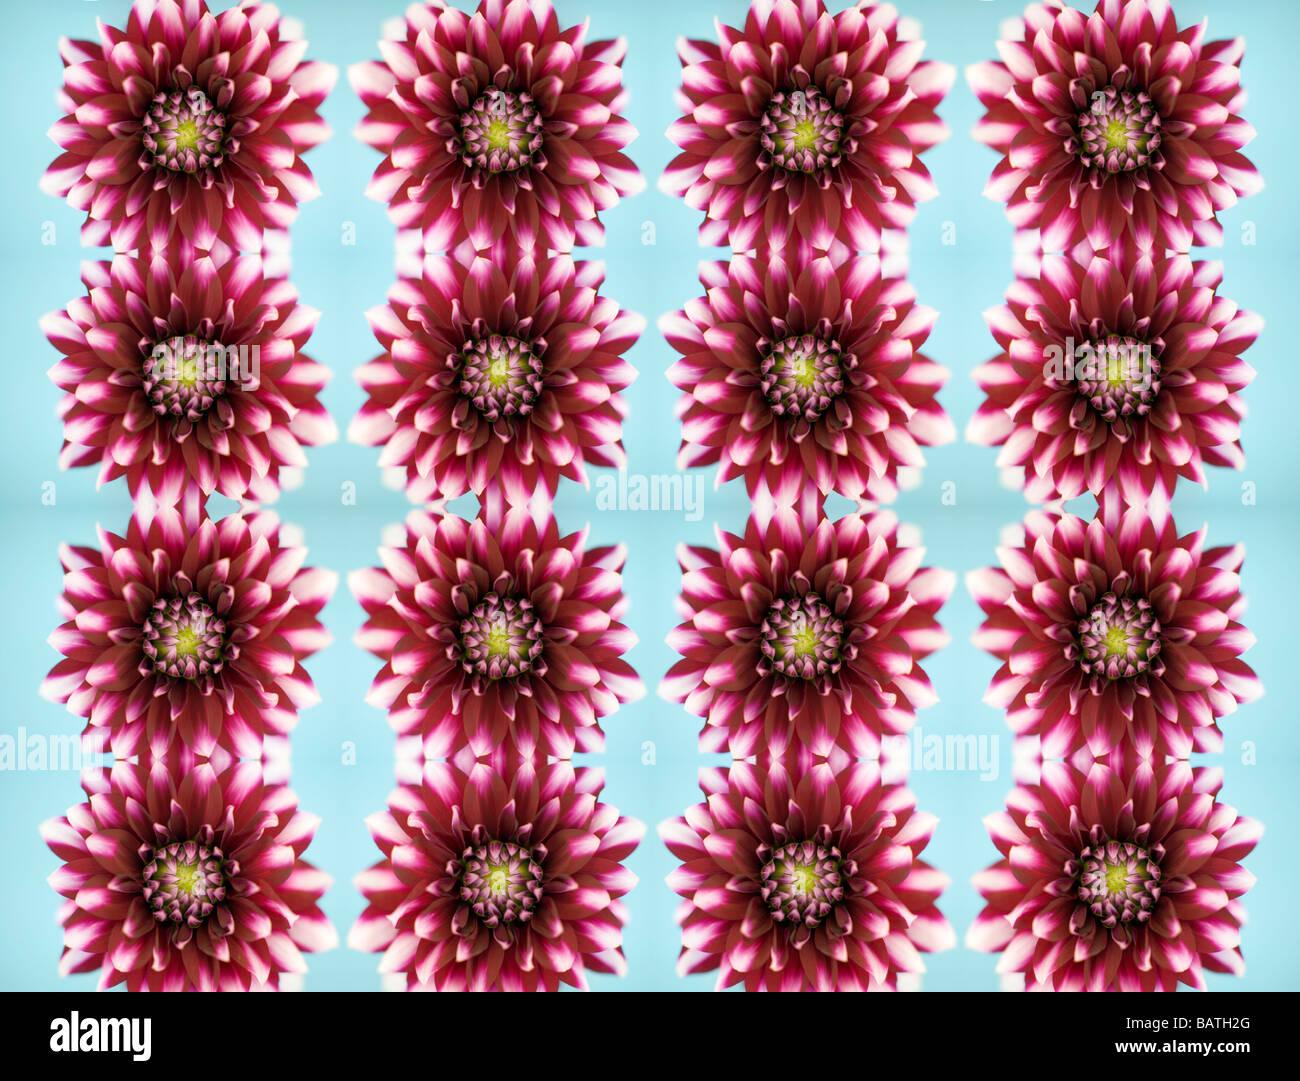 Dalia flores, imagen abstracta. Imagen De Stock